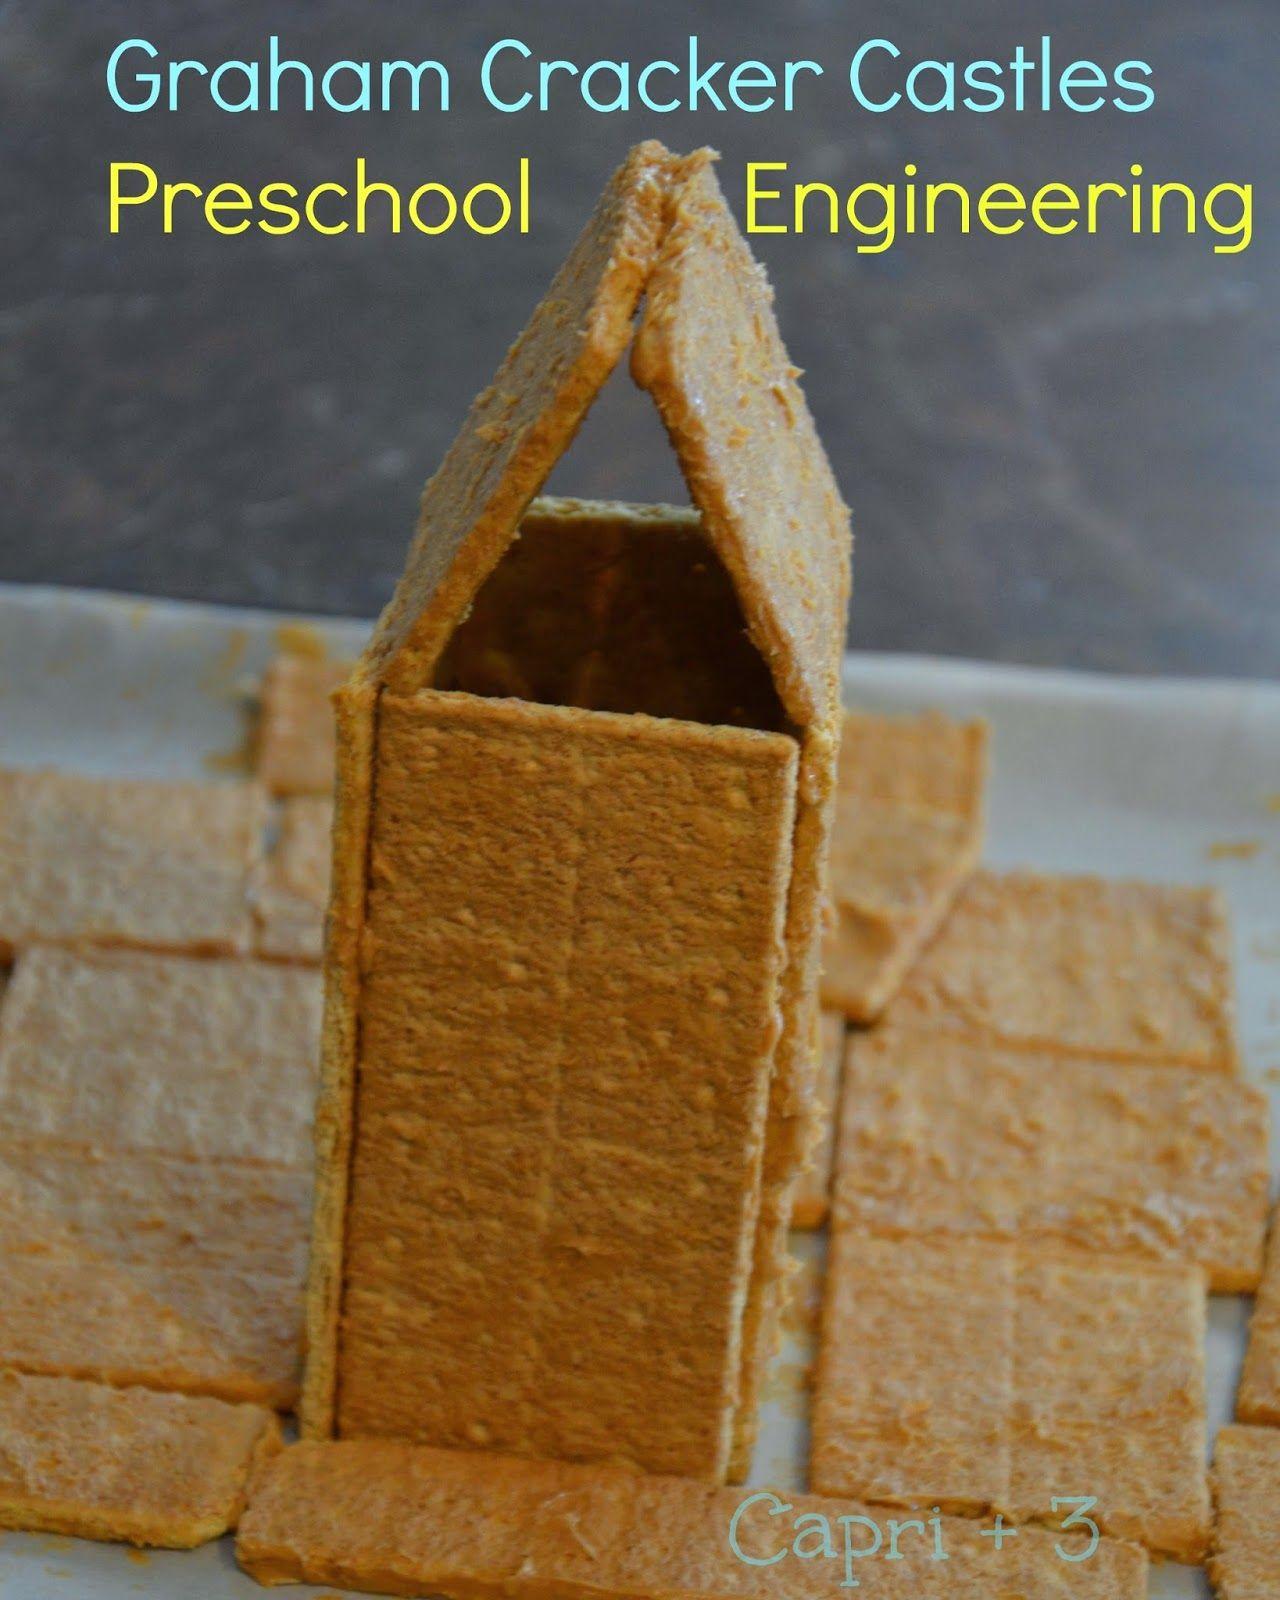 Capri 3 Graham Cracker Castles Preschool Engineering